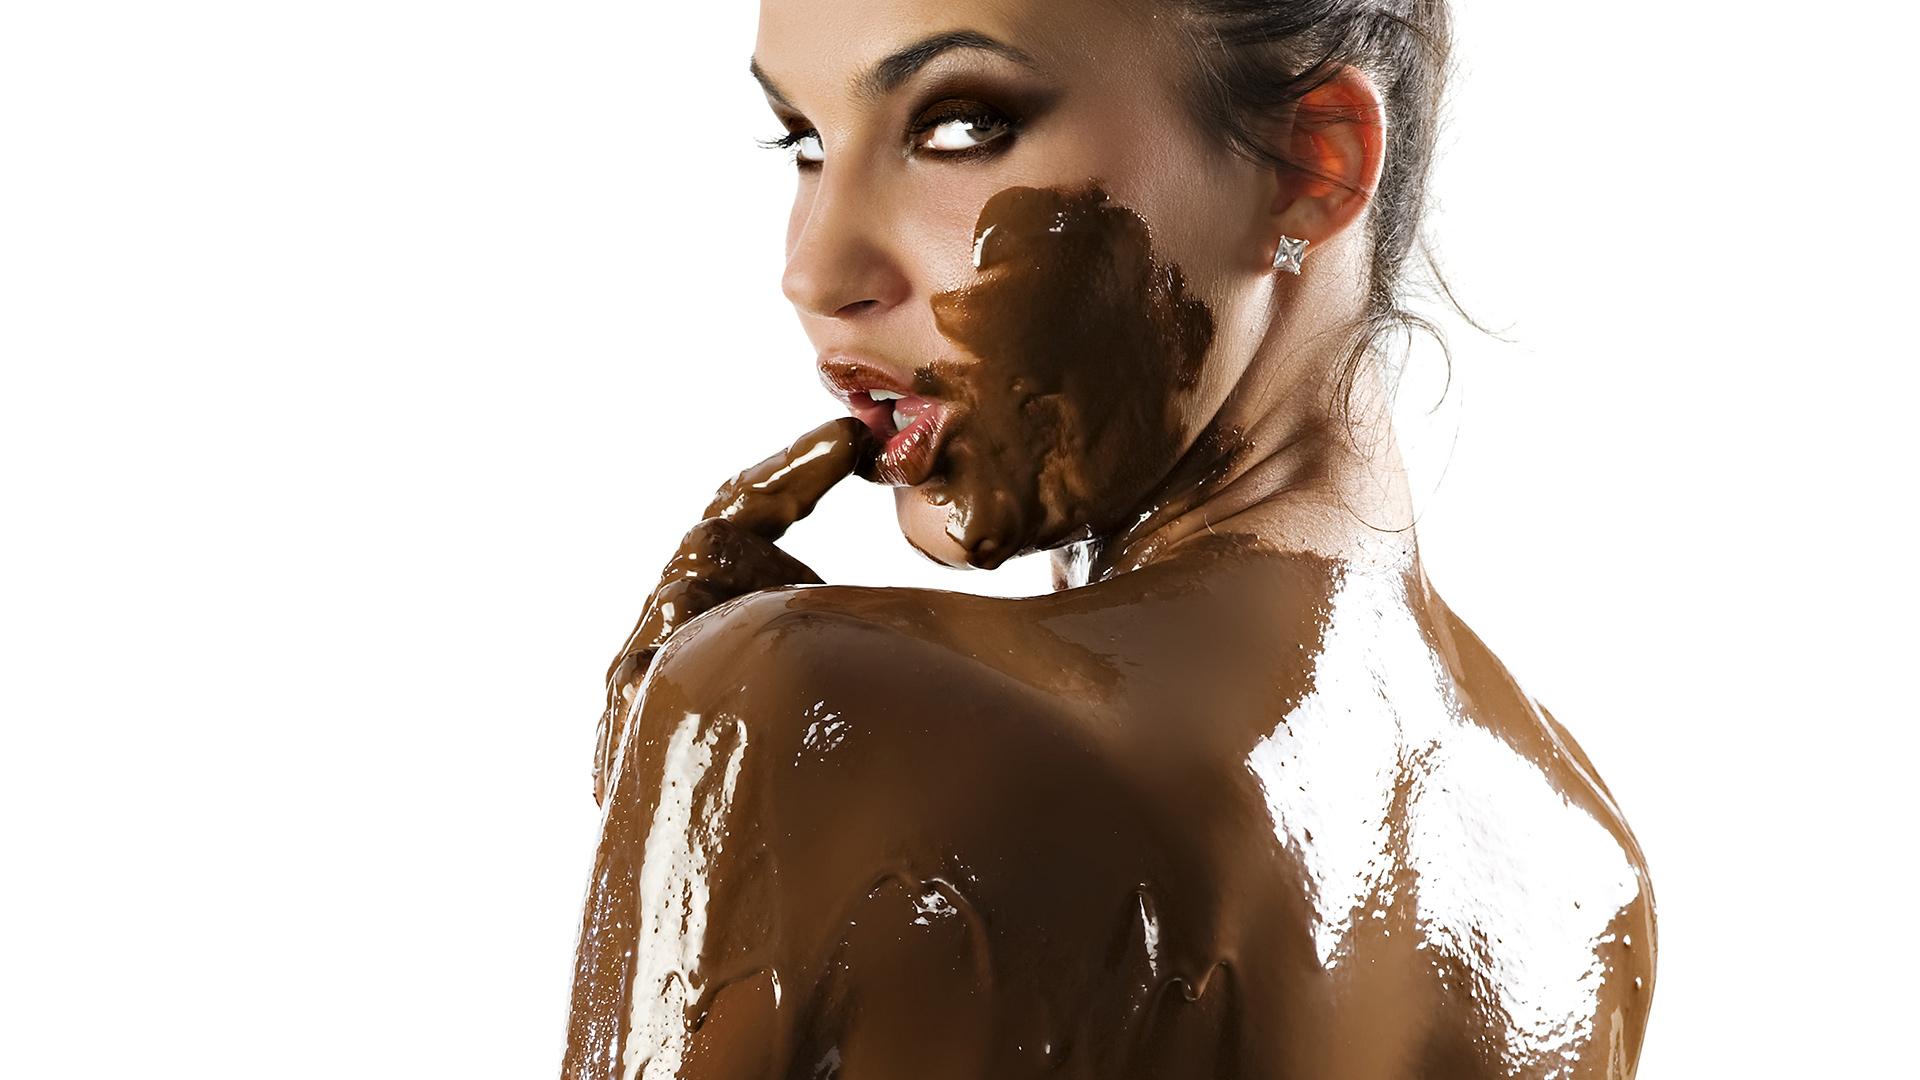 девушка вымазалась в шоколаде, шоколад, обои, chocolate girl wallpaper